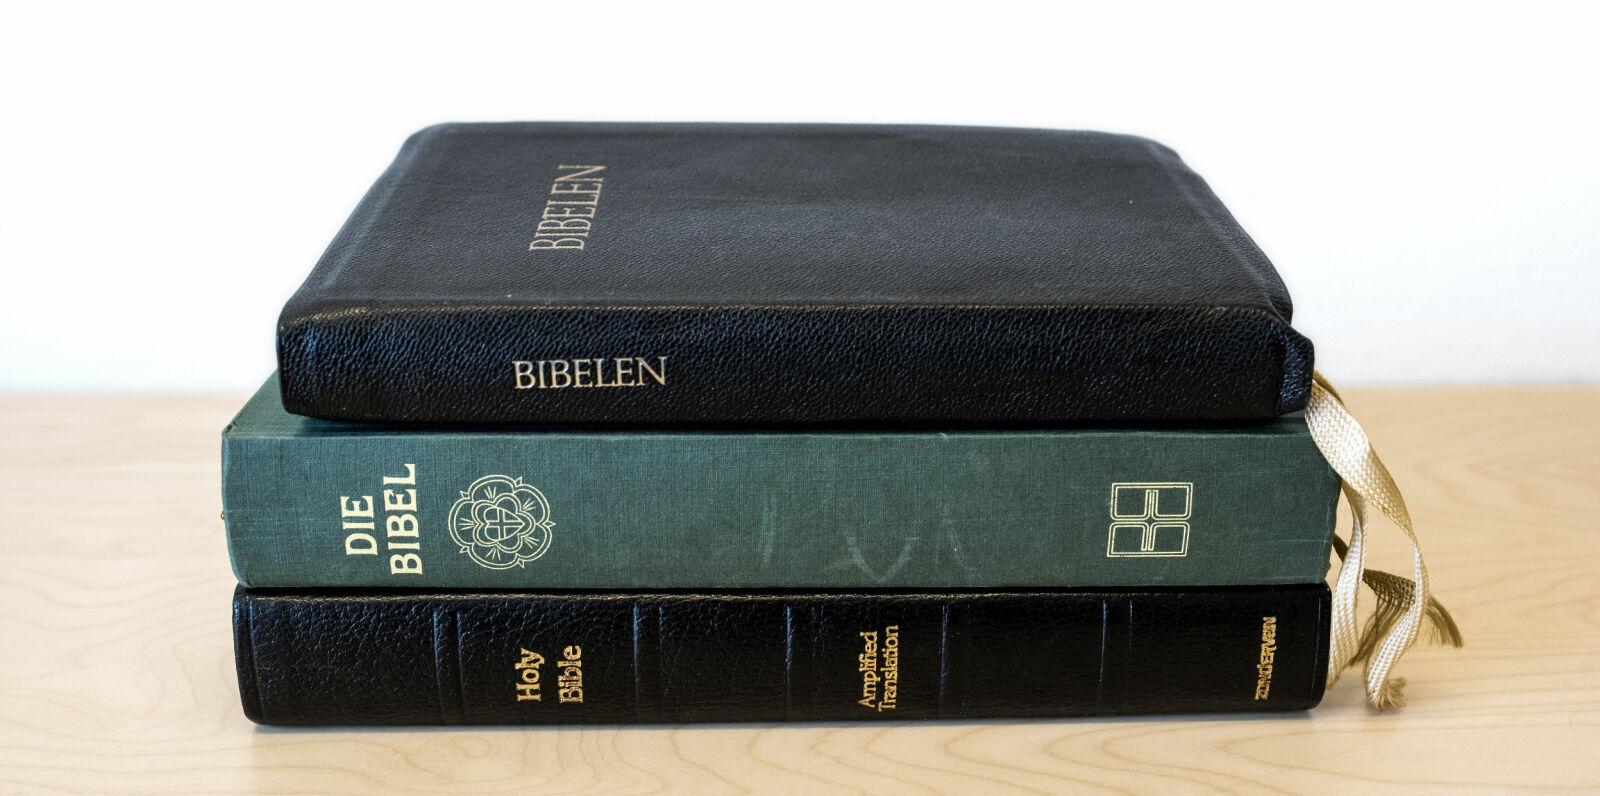 Biblene: Hepsø hadde disse tre biblene liggende på nattbordet. En engelsk, en tysk og en norsk.